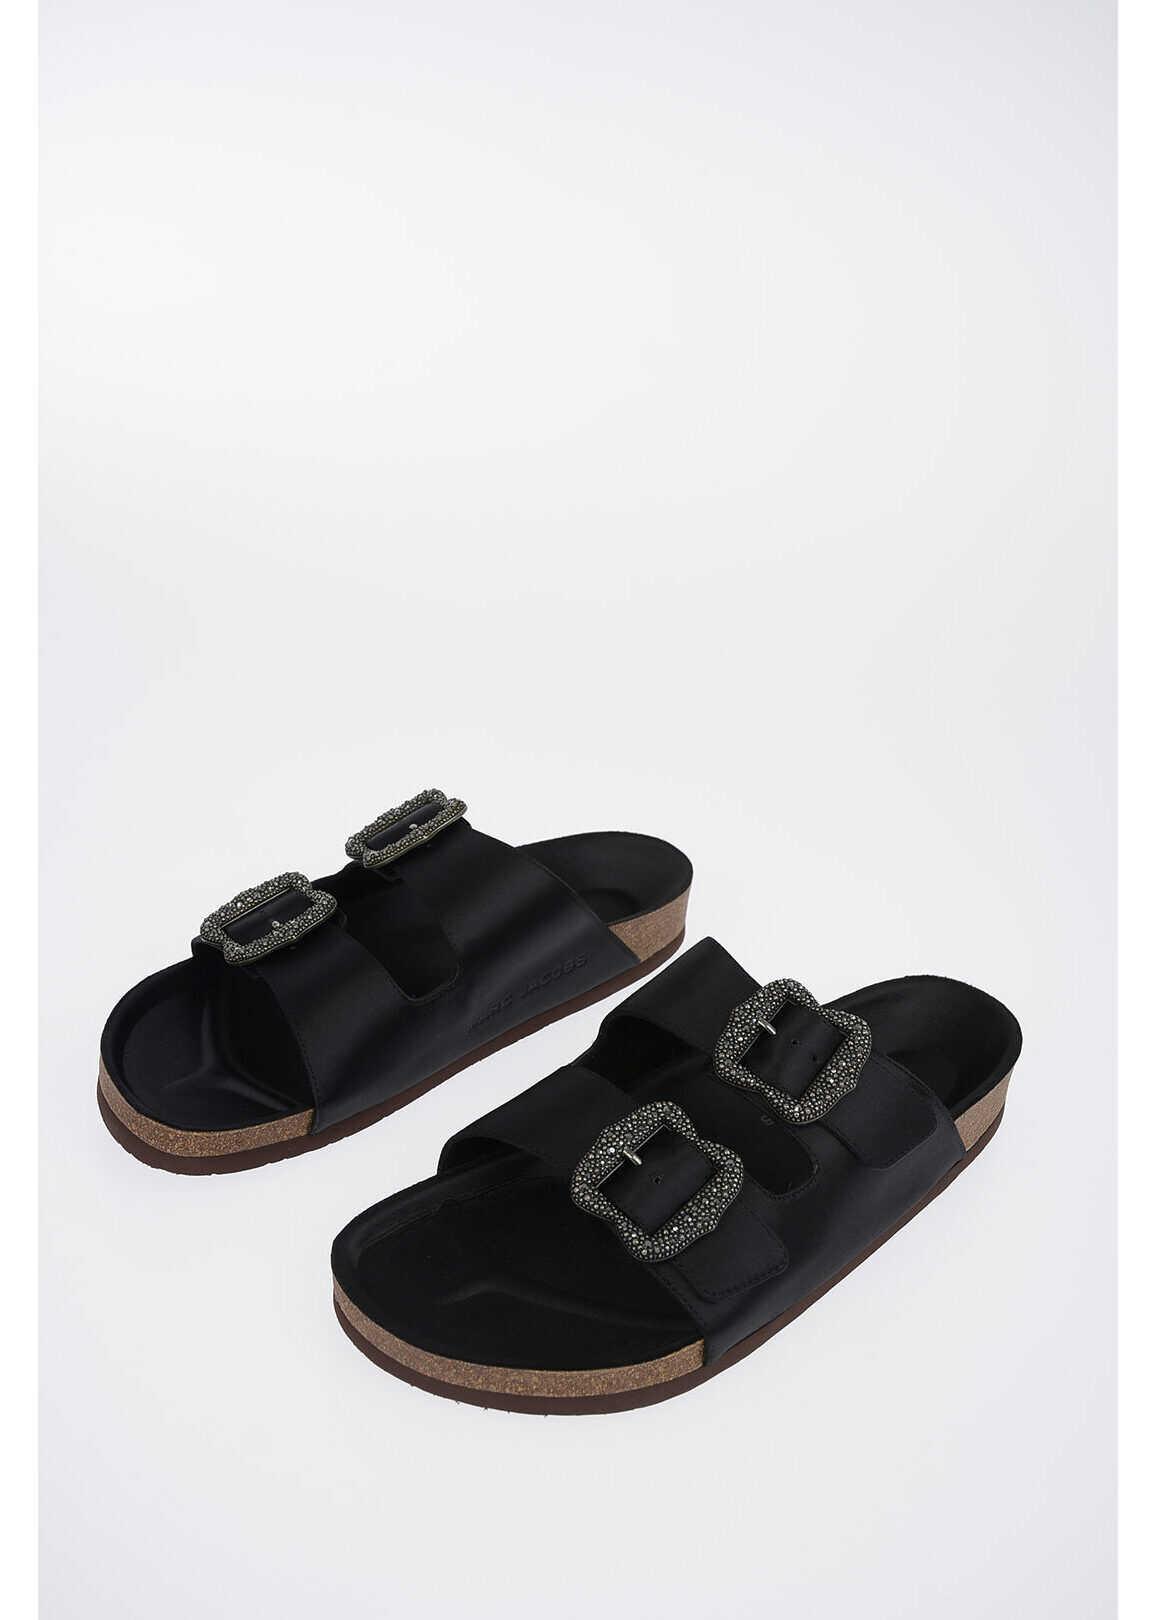 Marc Jacobs REDUX GRUNGE leather sandals BLACK